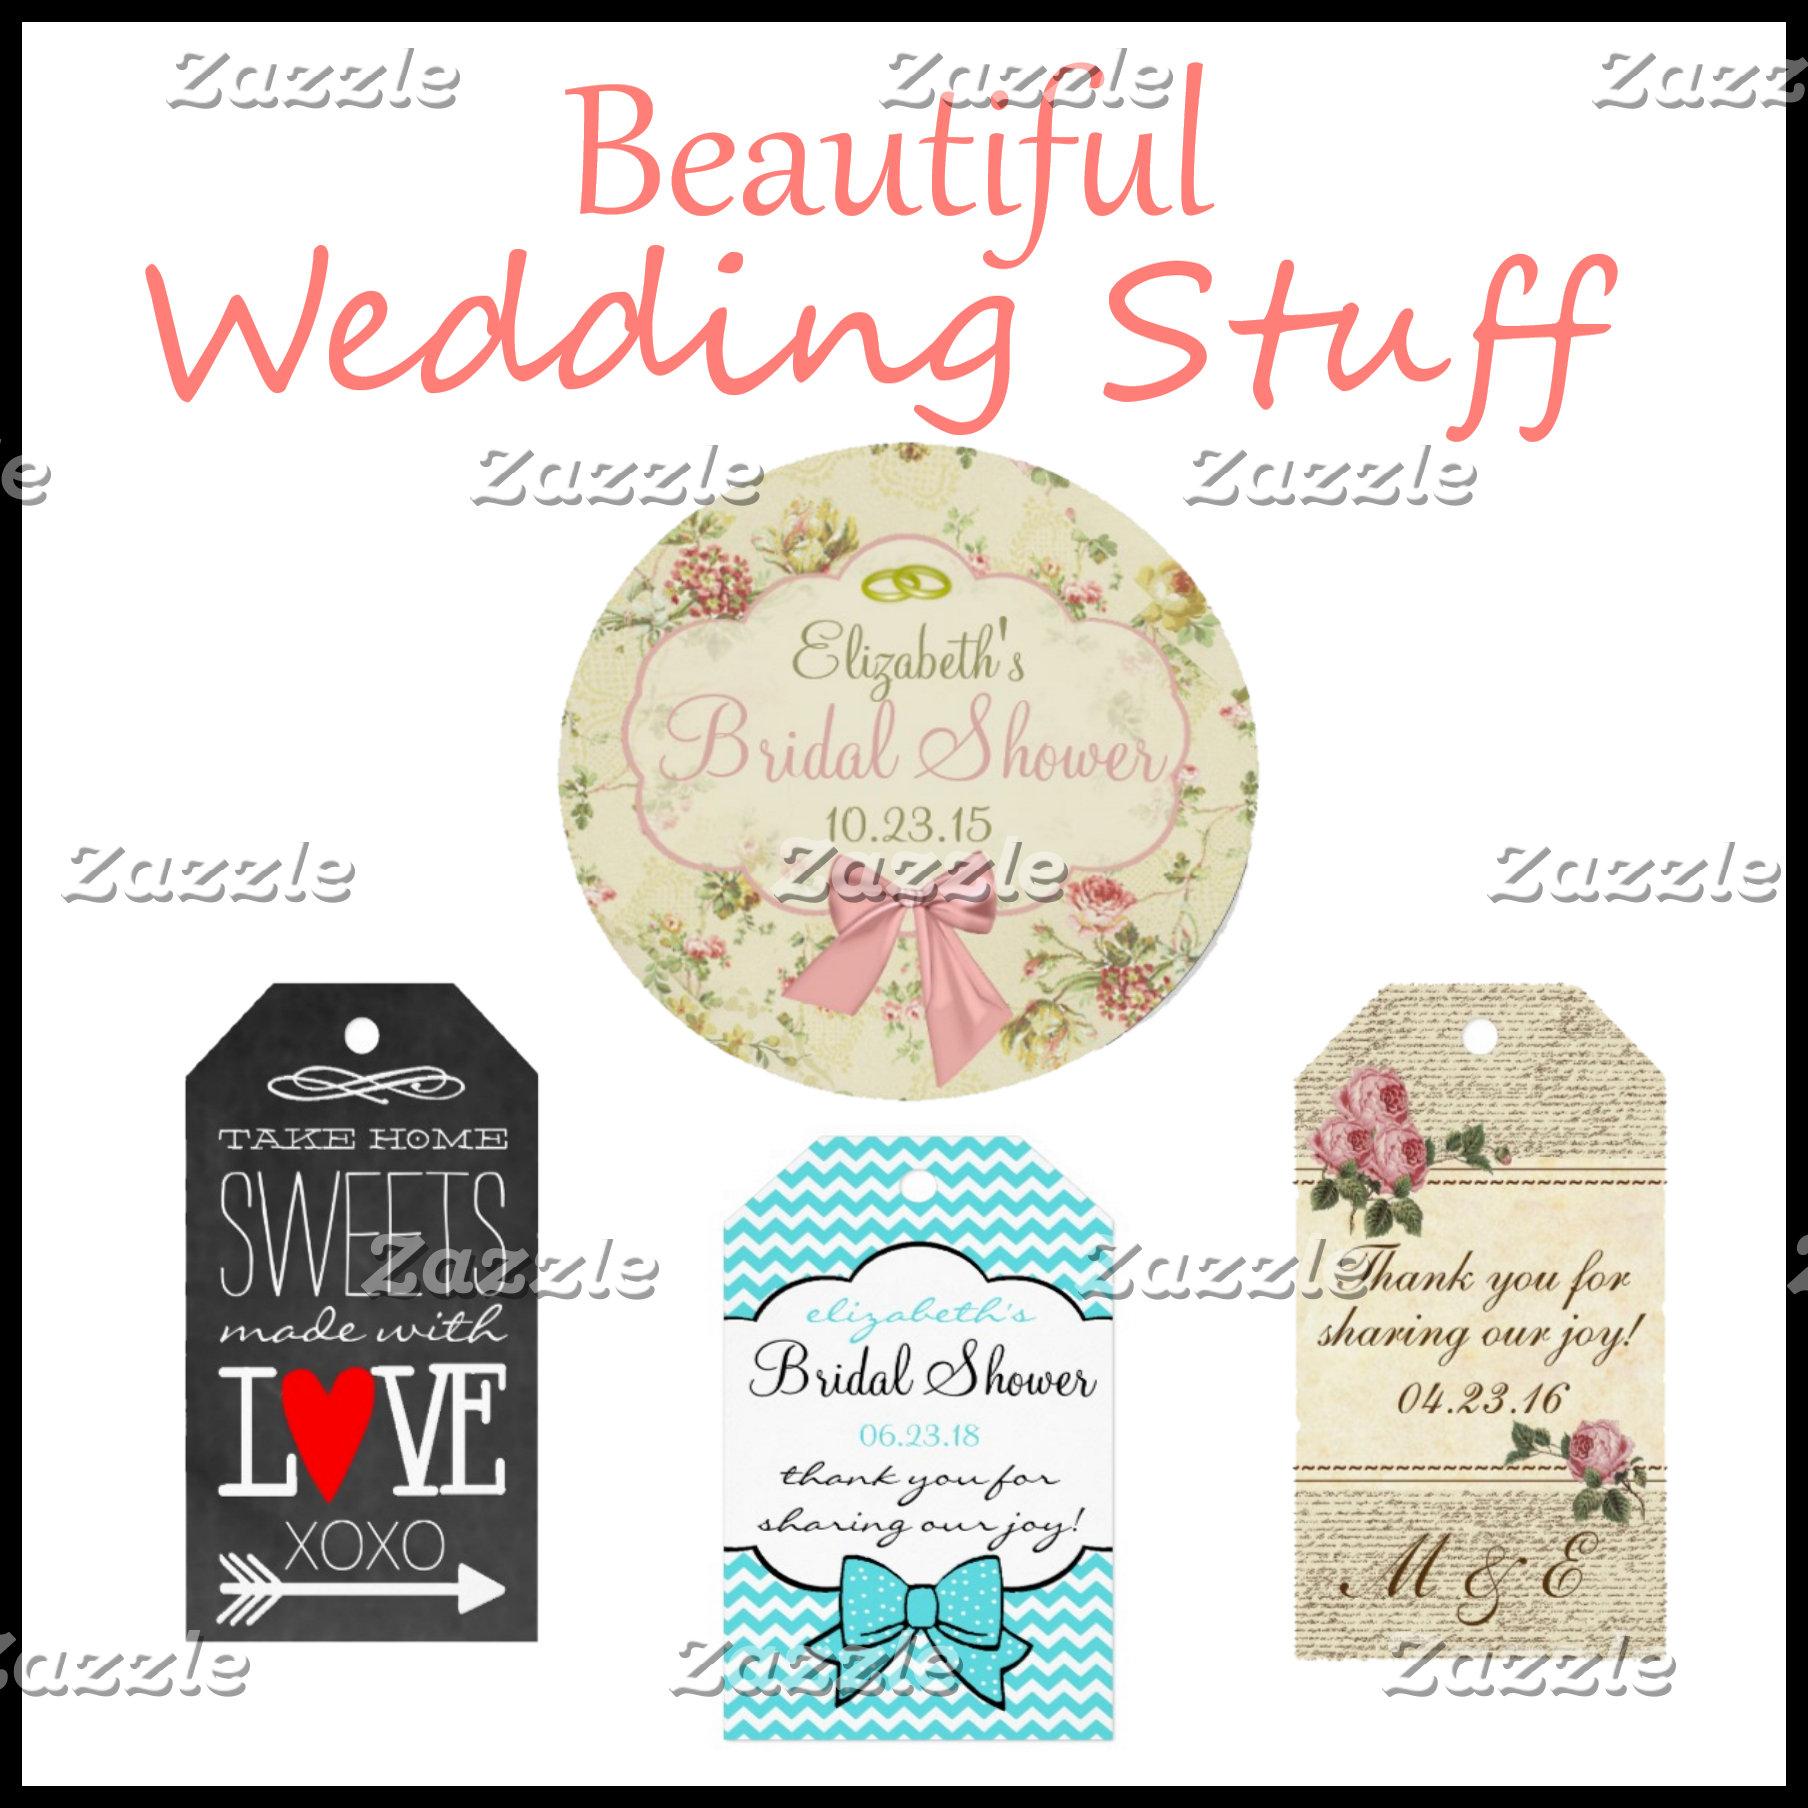 Wedding Stuff Here!